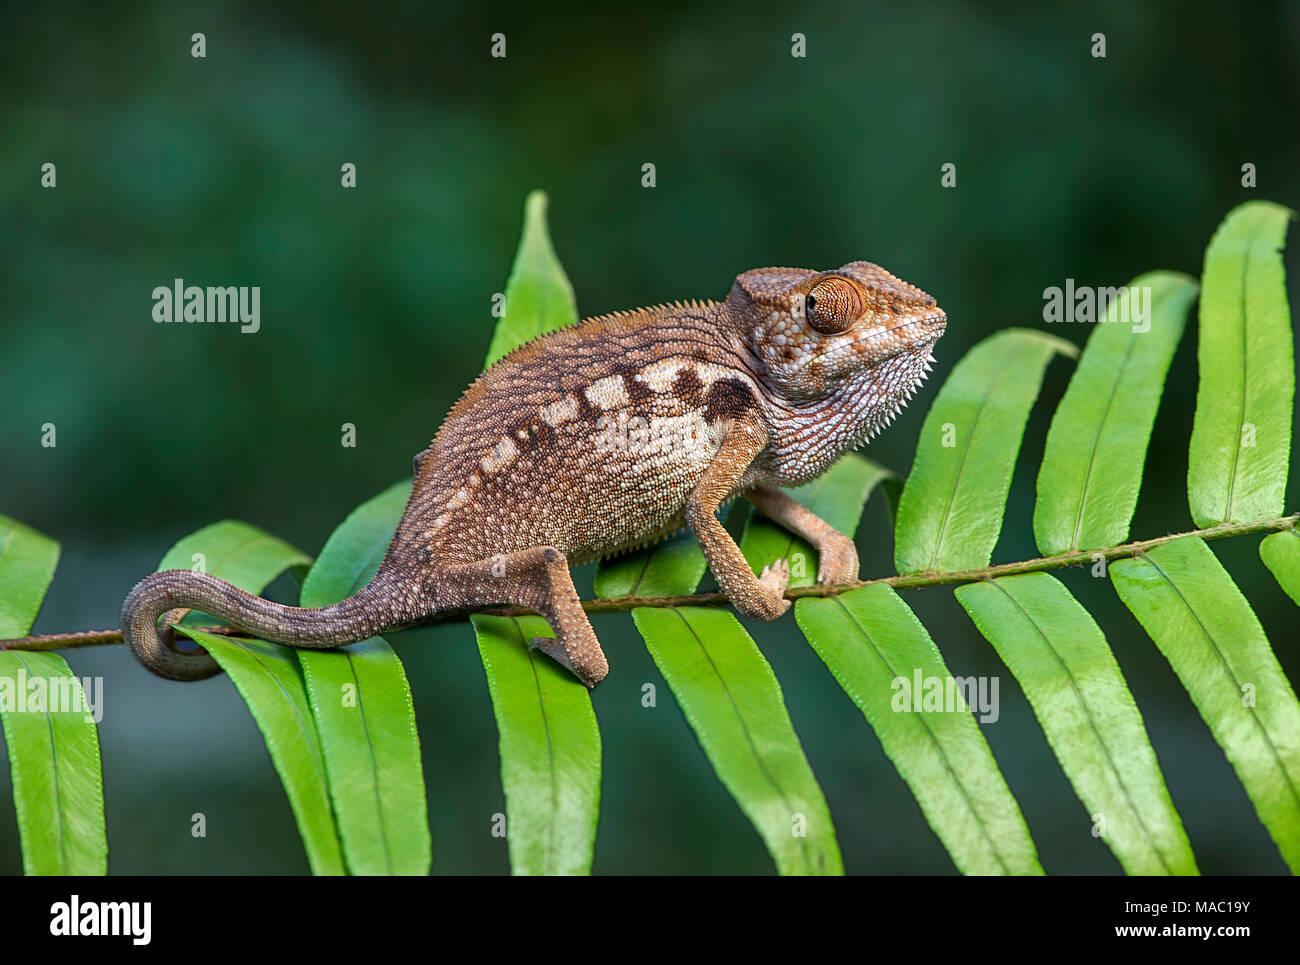 Panther chameleon (Furcifer pardalis), (Chameleonidae), endemisch auf Madagaskar, Ankanin Ny Nofy, Madagaskar Stockbild